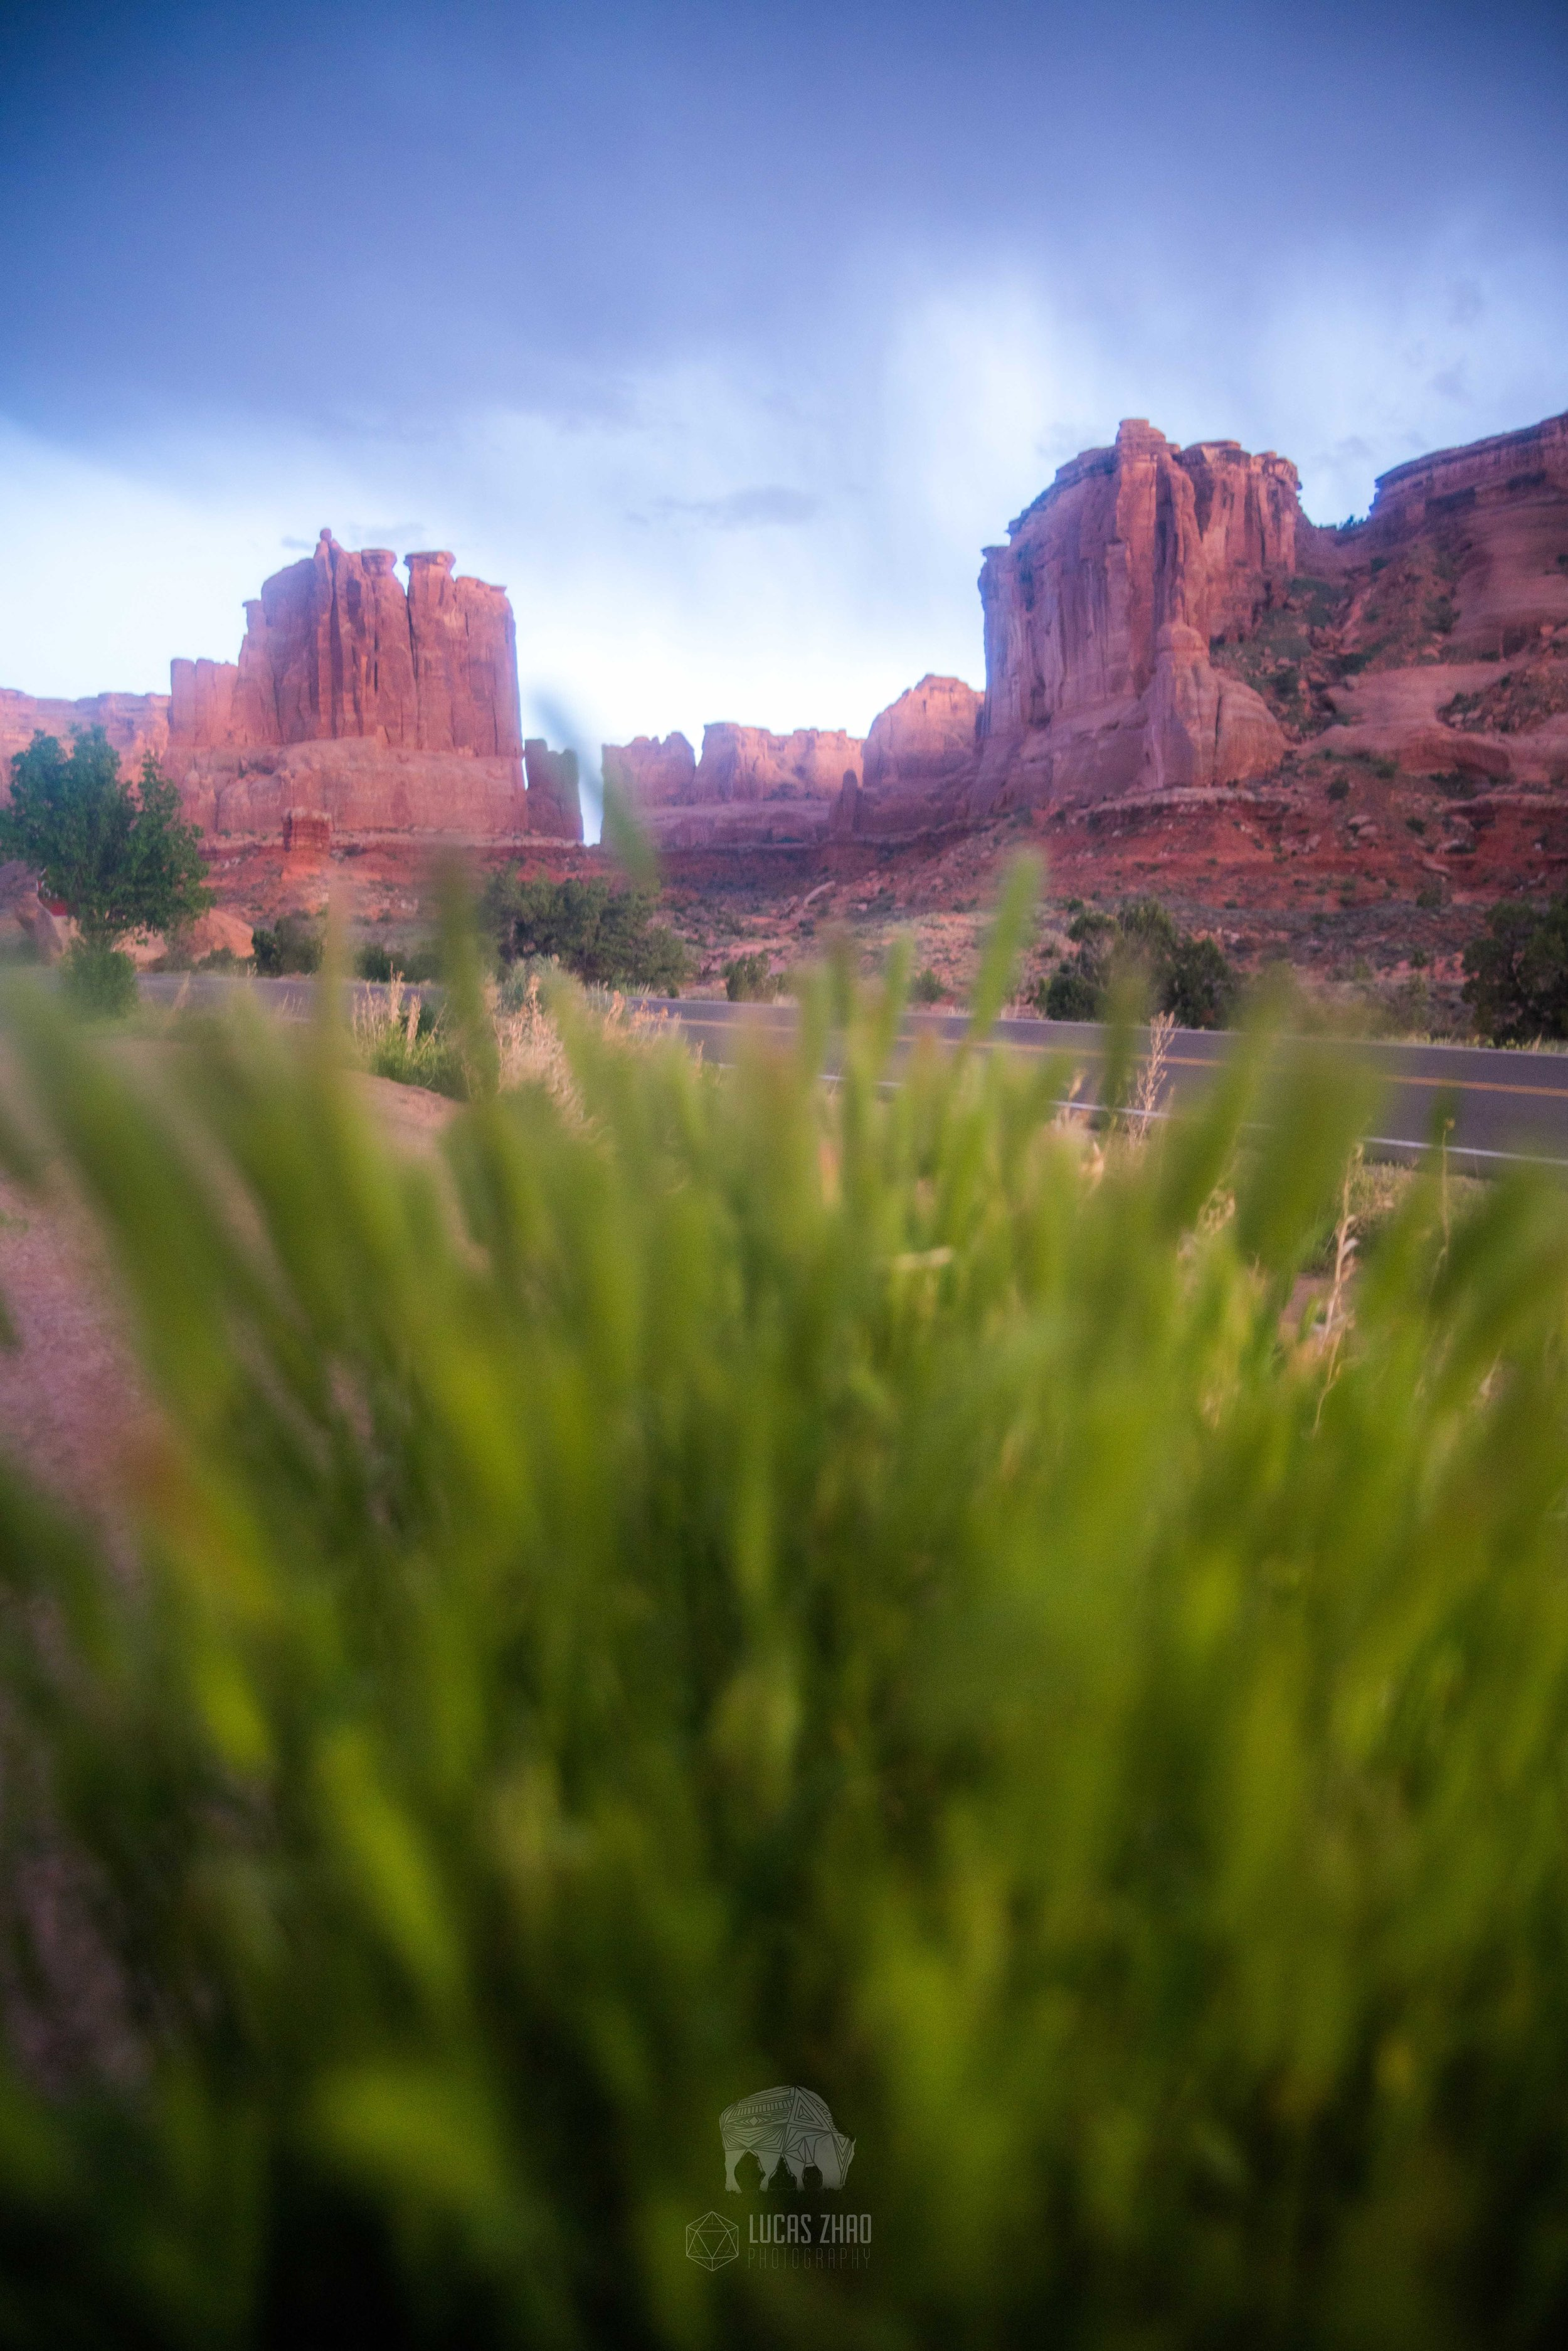 Landscape - Soul of the earth's landscapes.